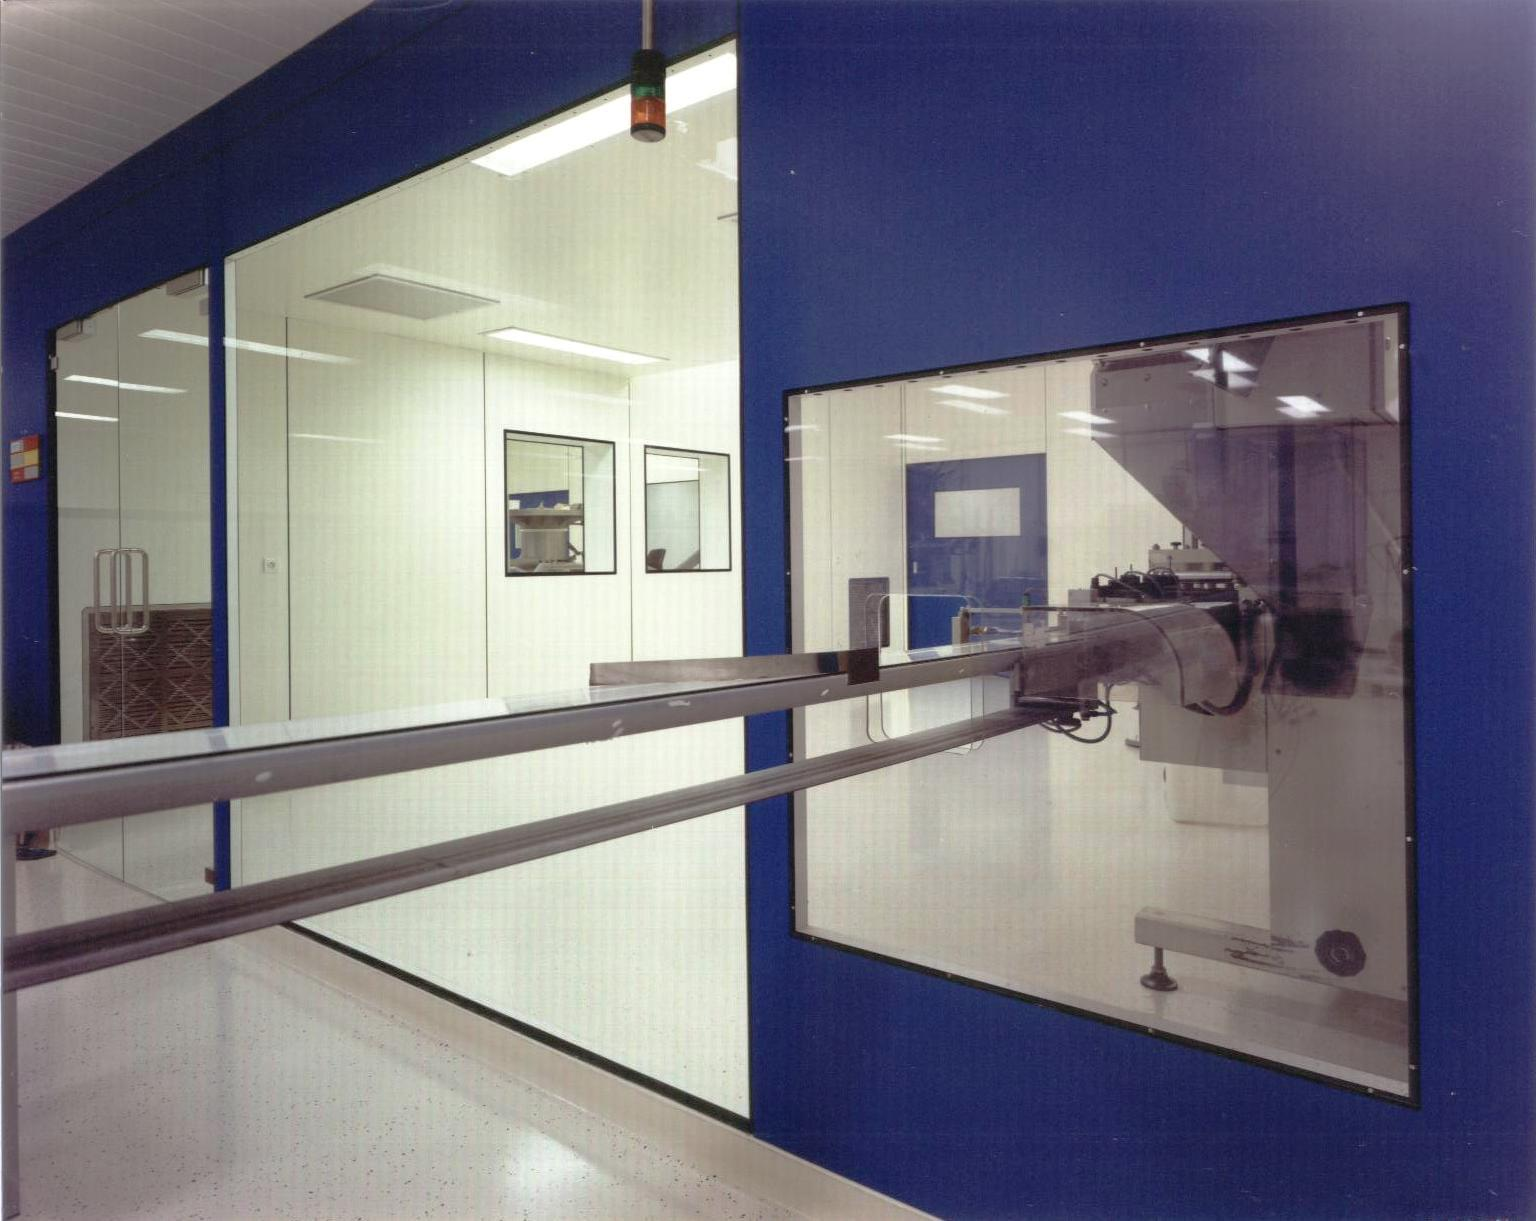 481-sanico-cleanroom-26